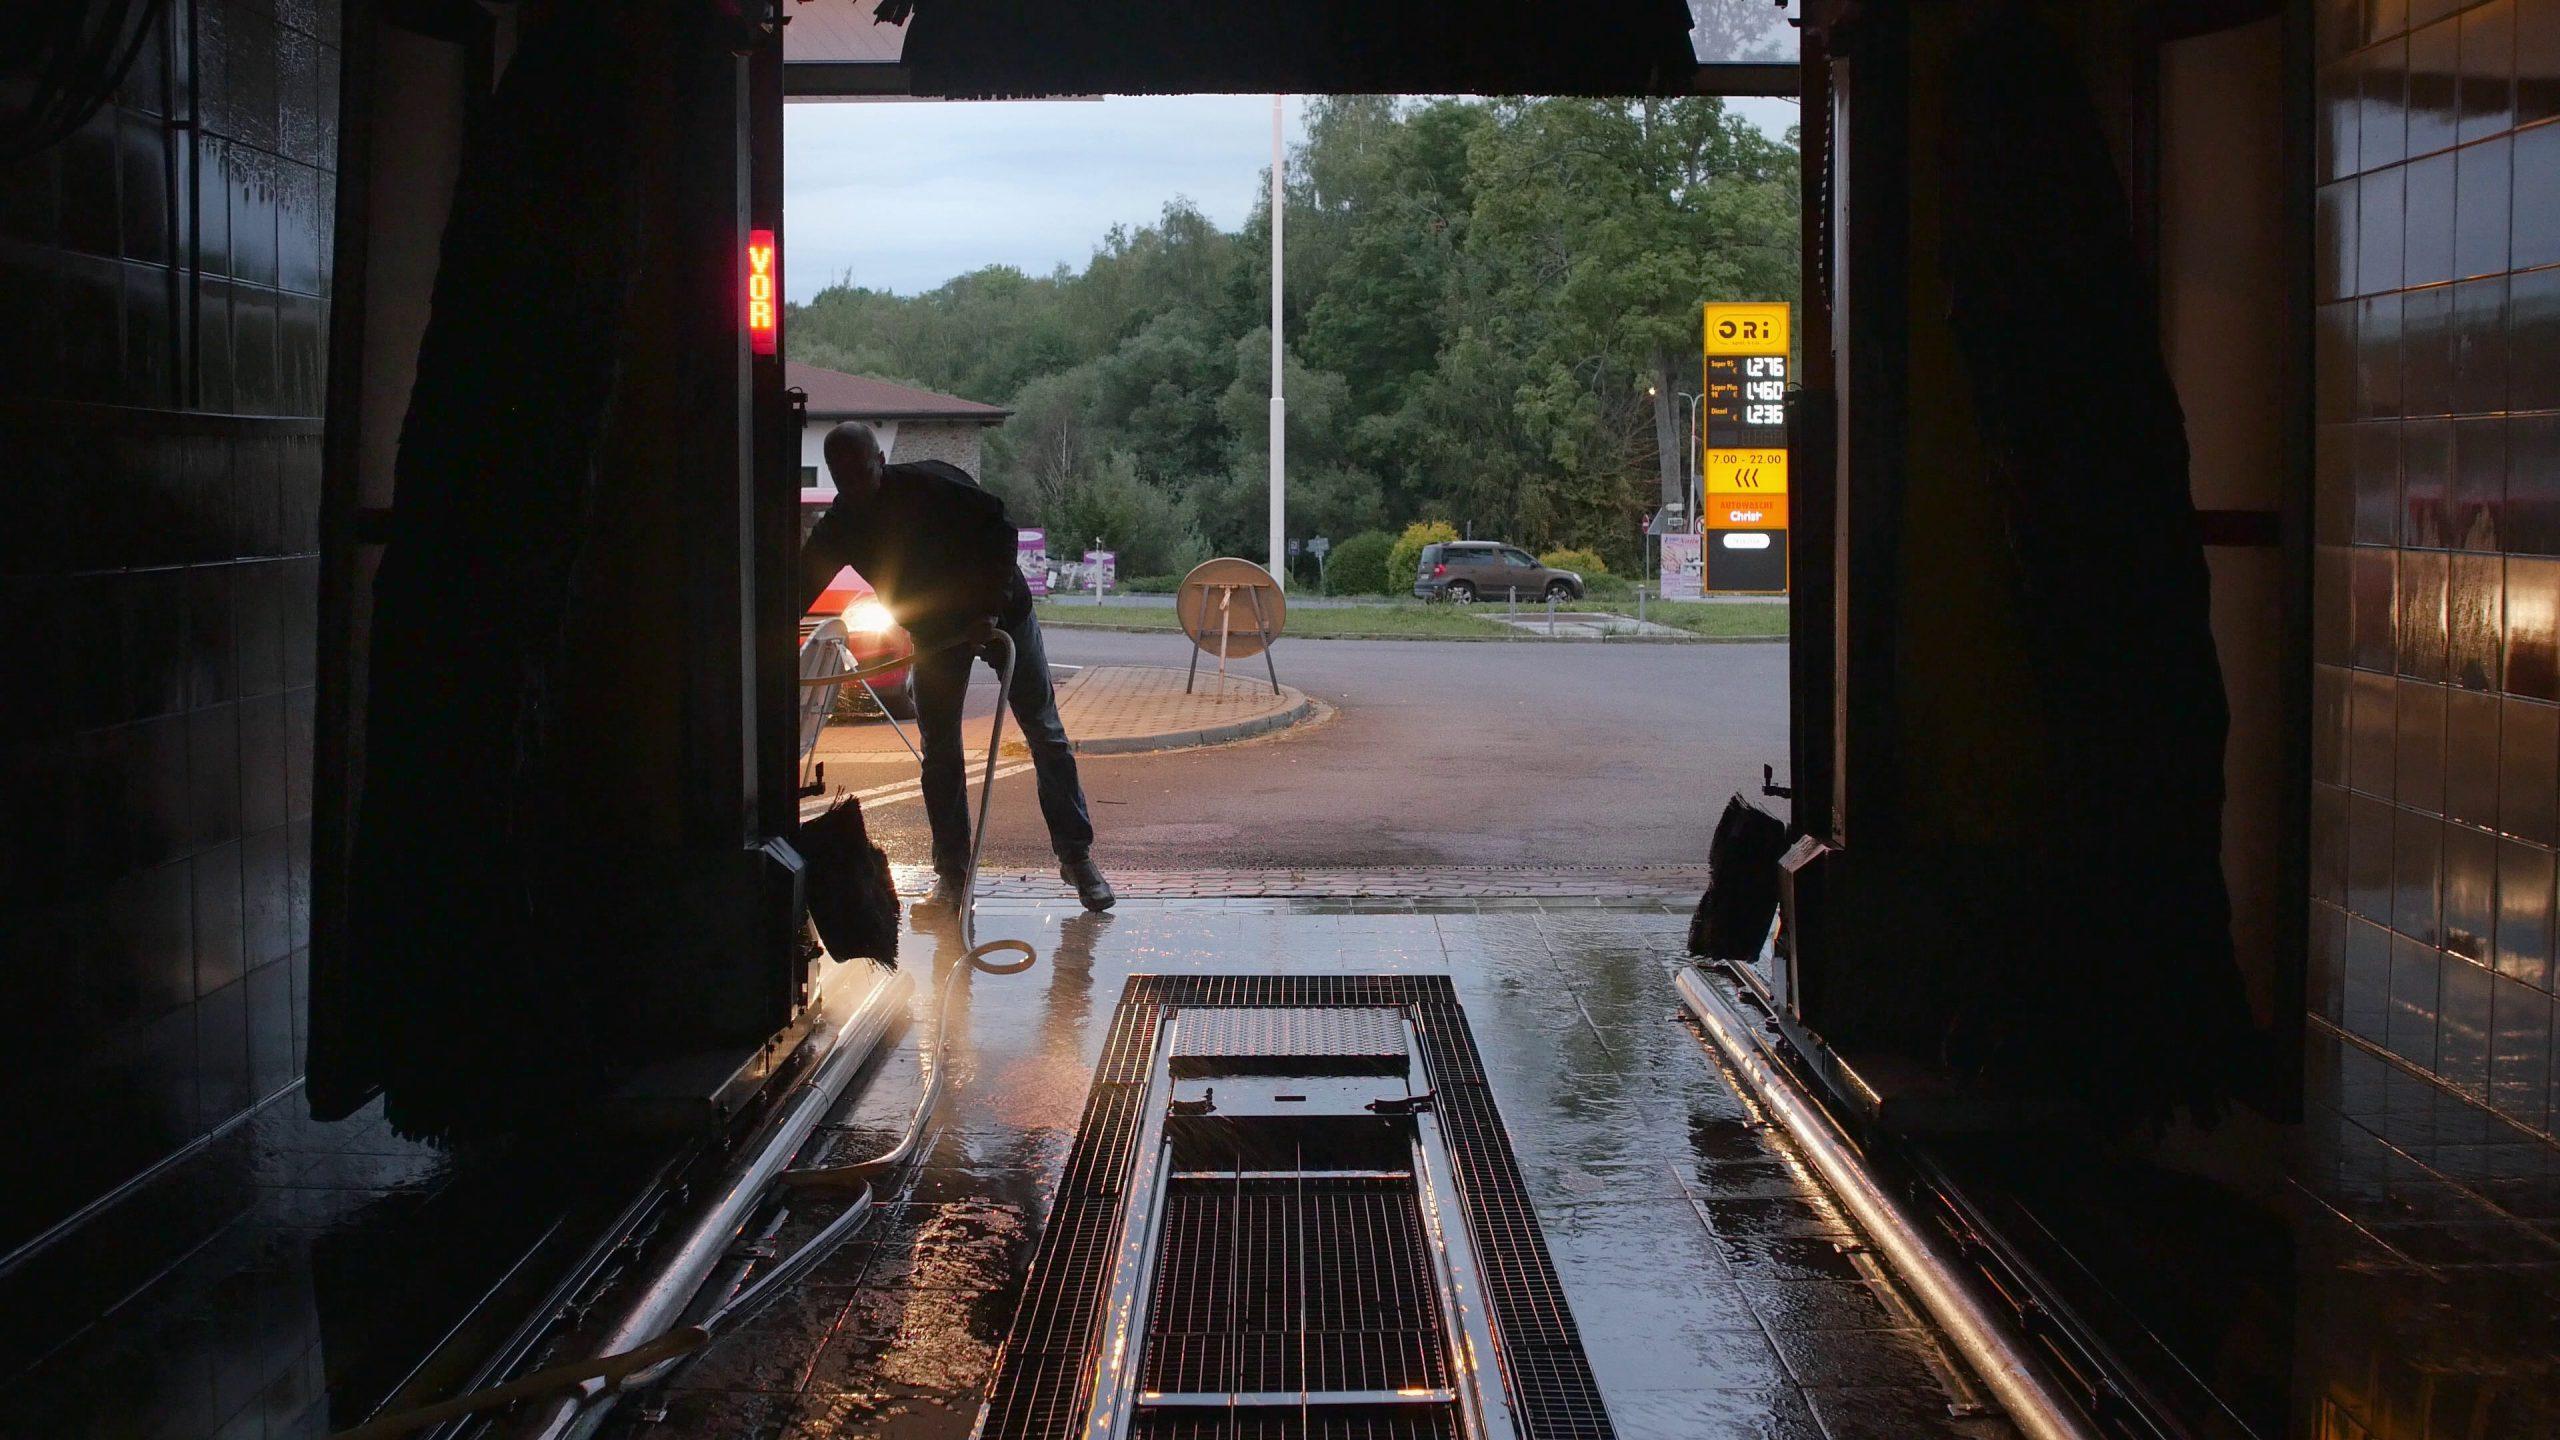 Die letzte erste Tanke | První a poslední pumpa